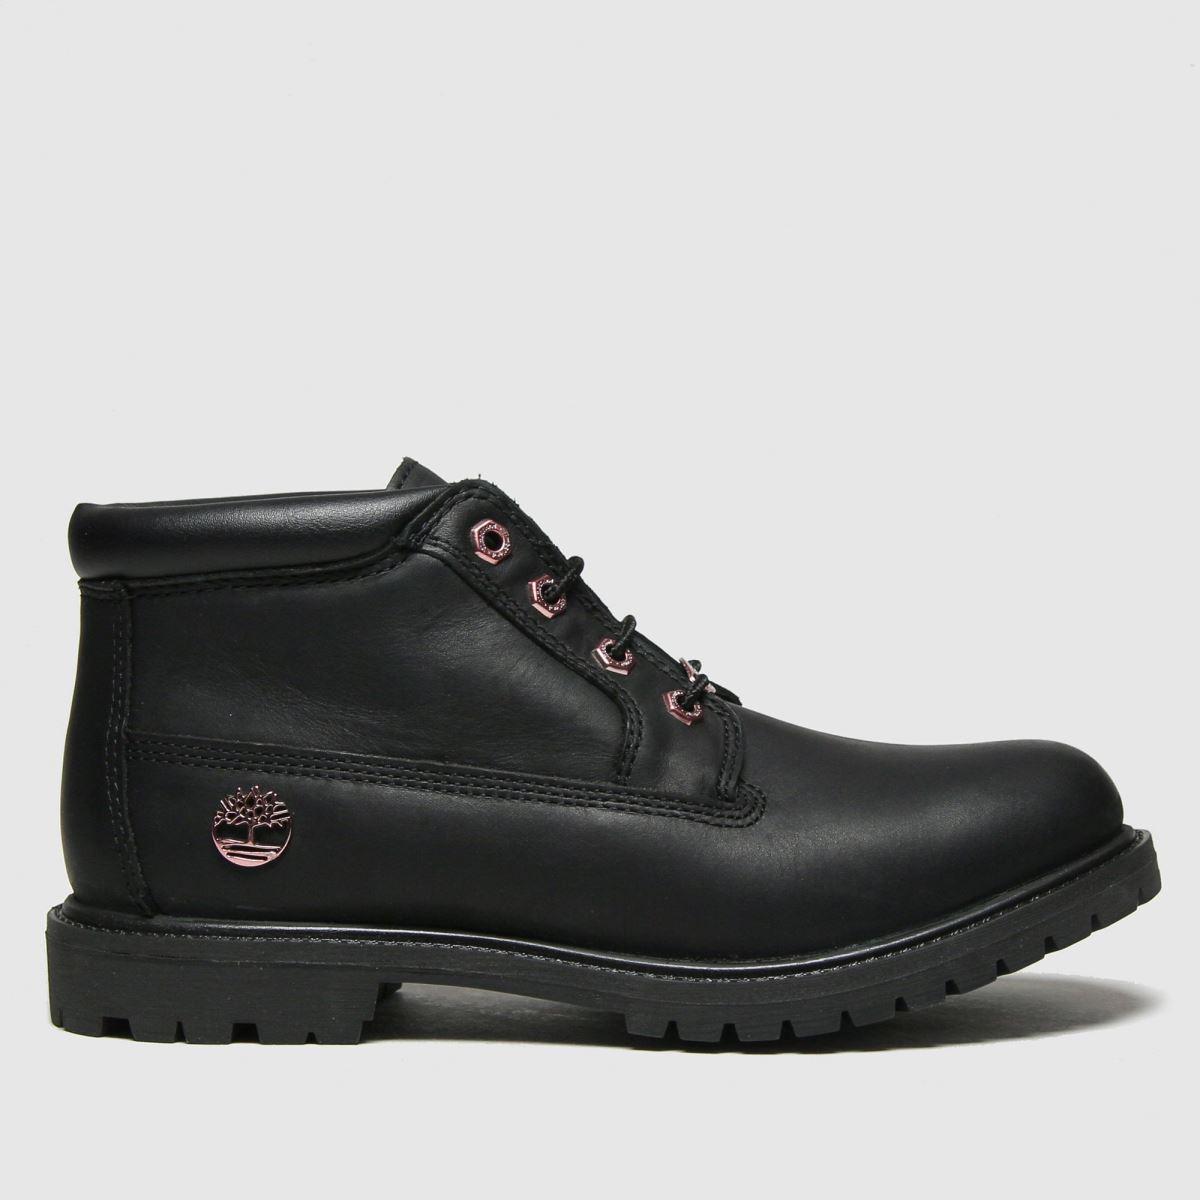 Timberland Black & Gold Nellie Chukka Boots